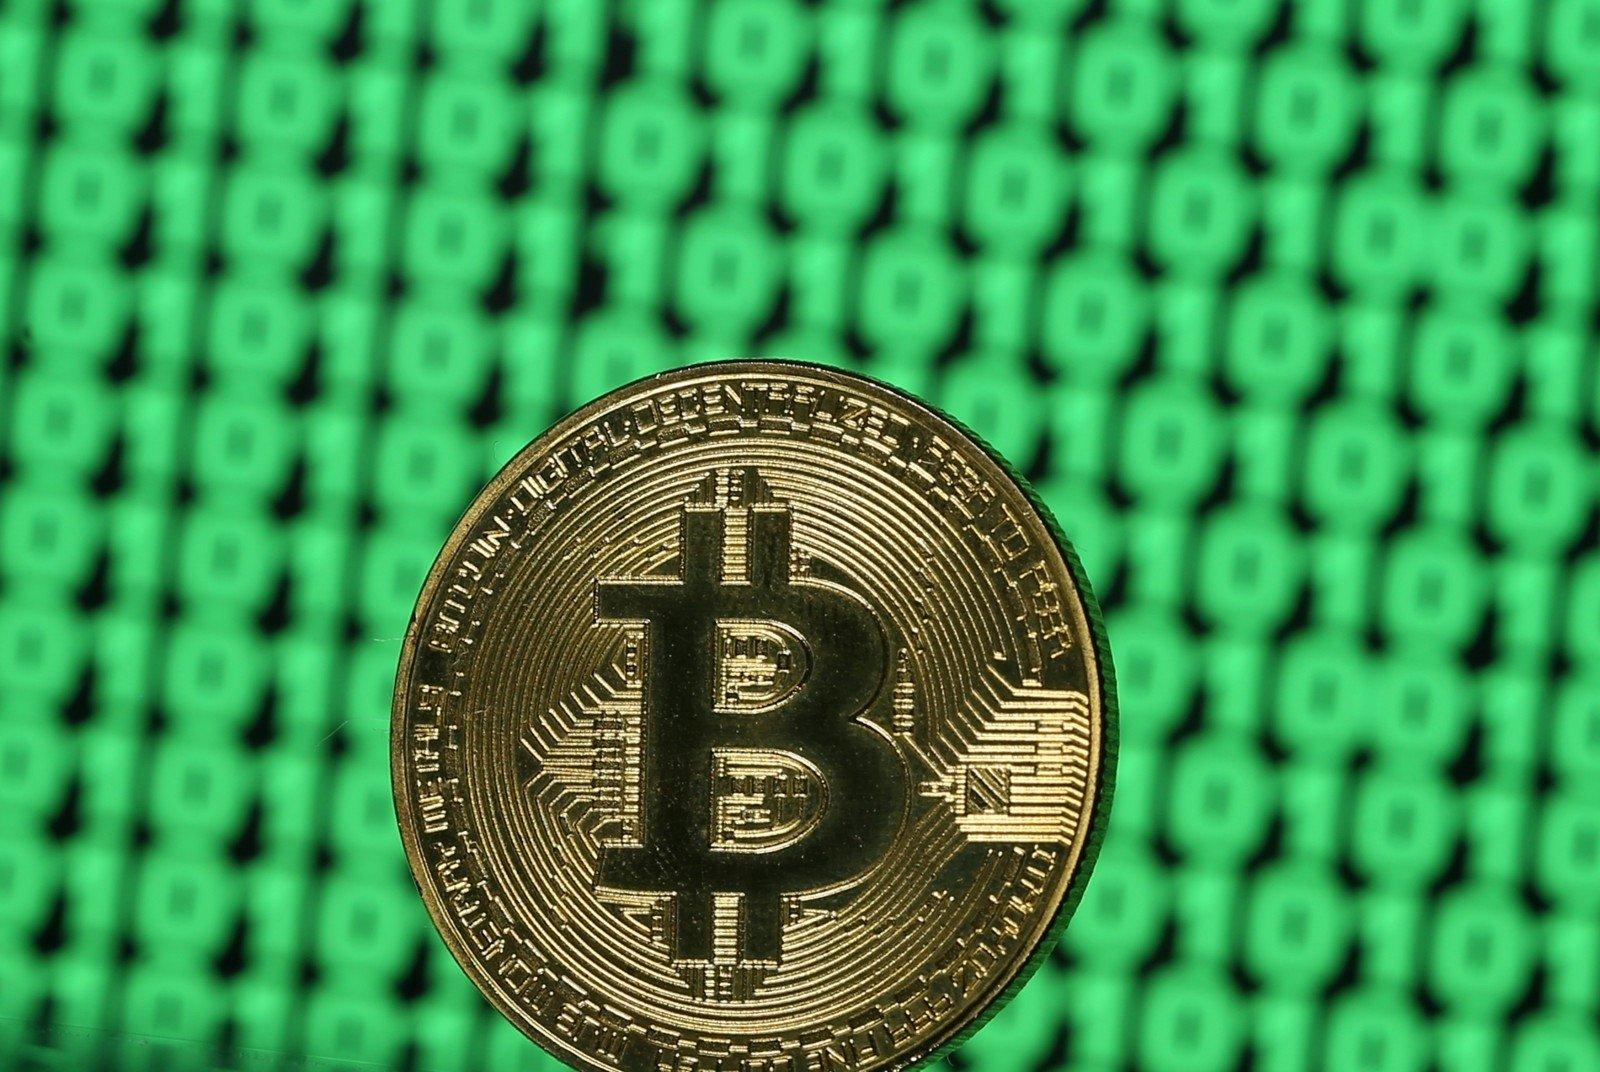 kriptovaliut pinigin